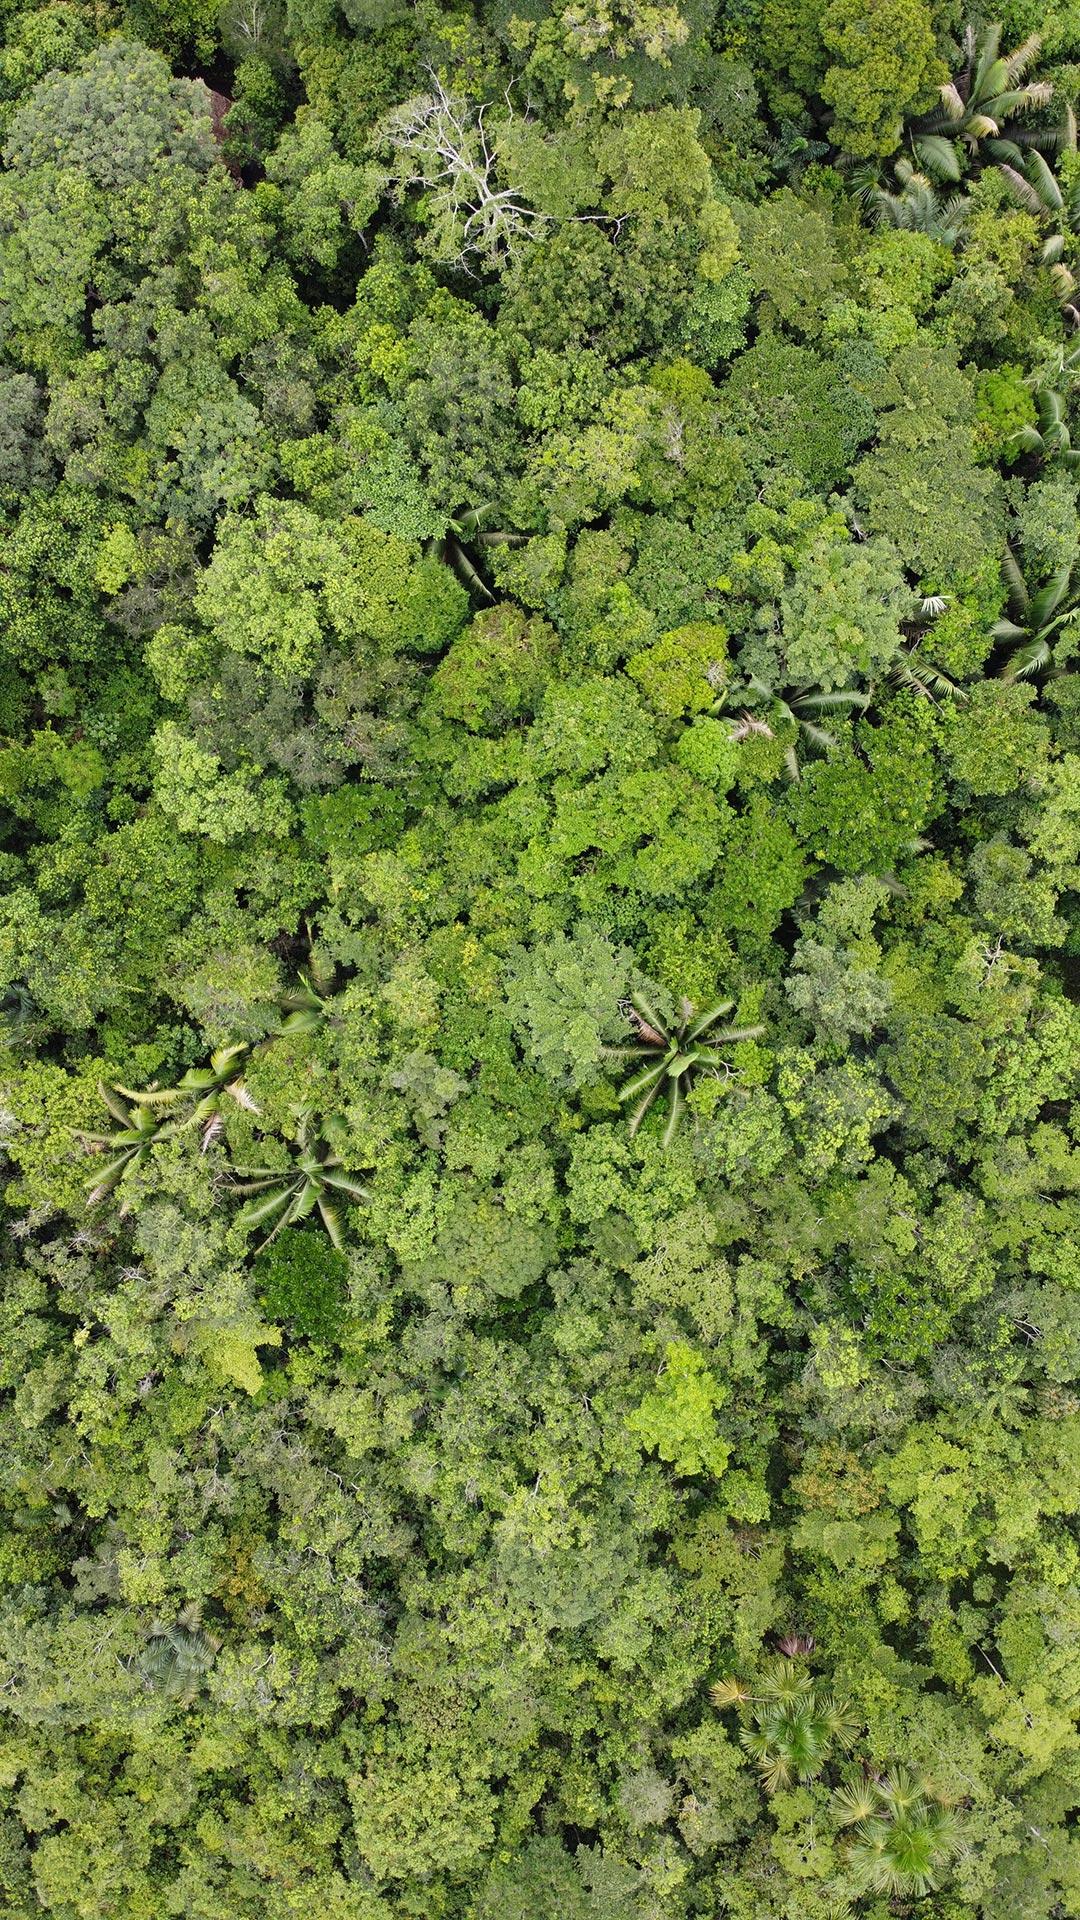 Mangrove © David Geere